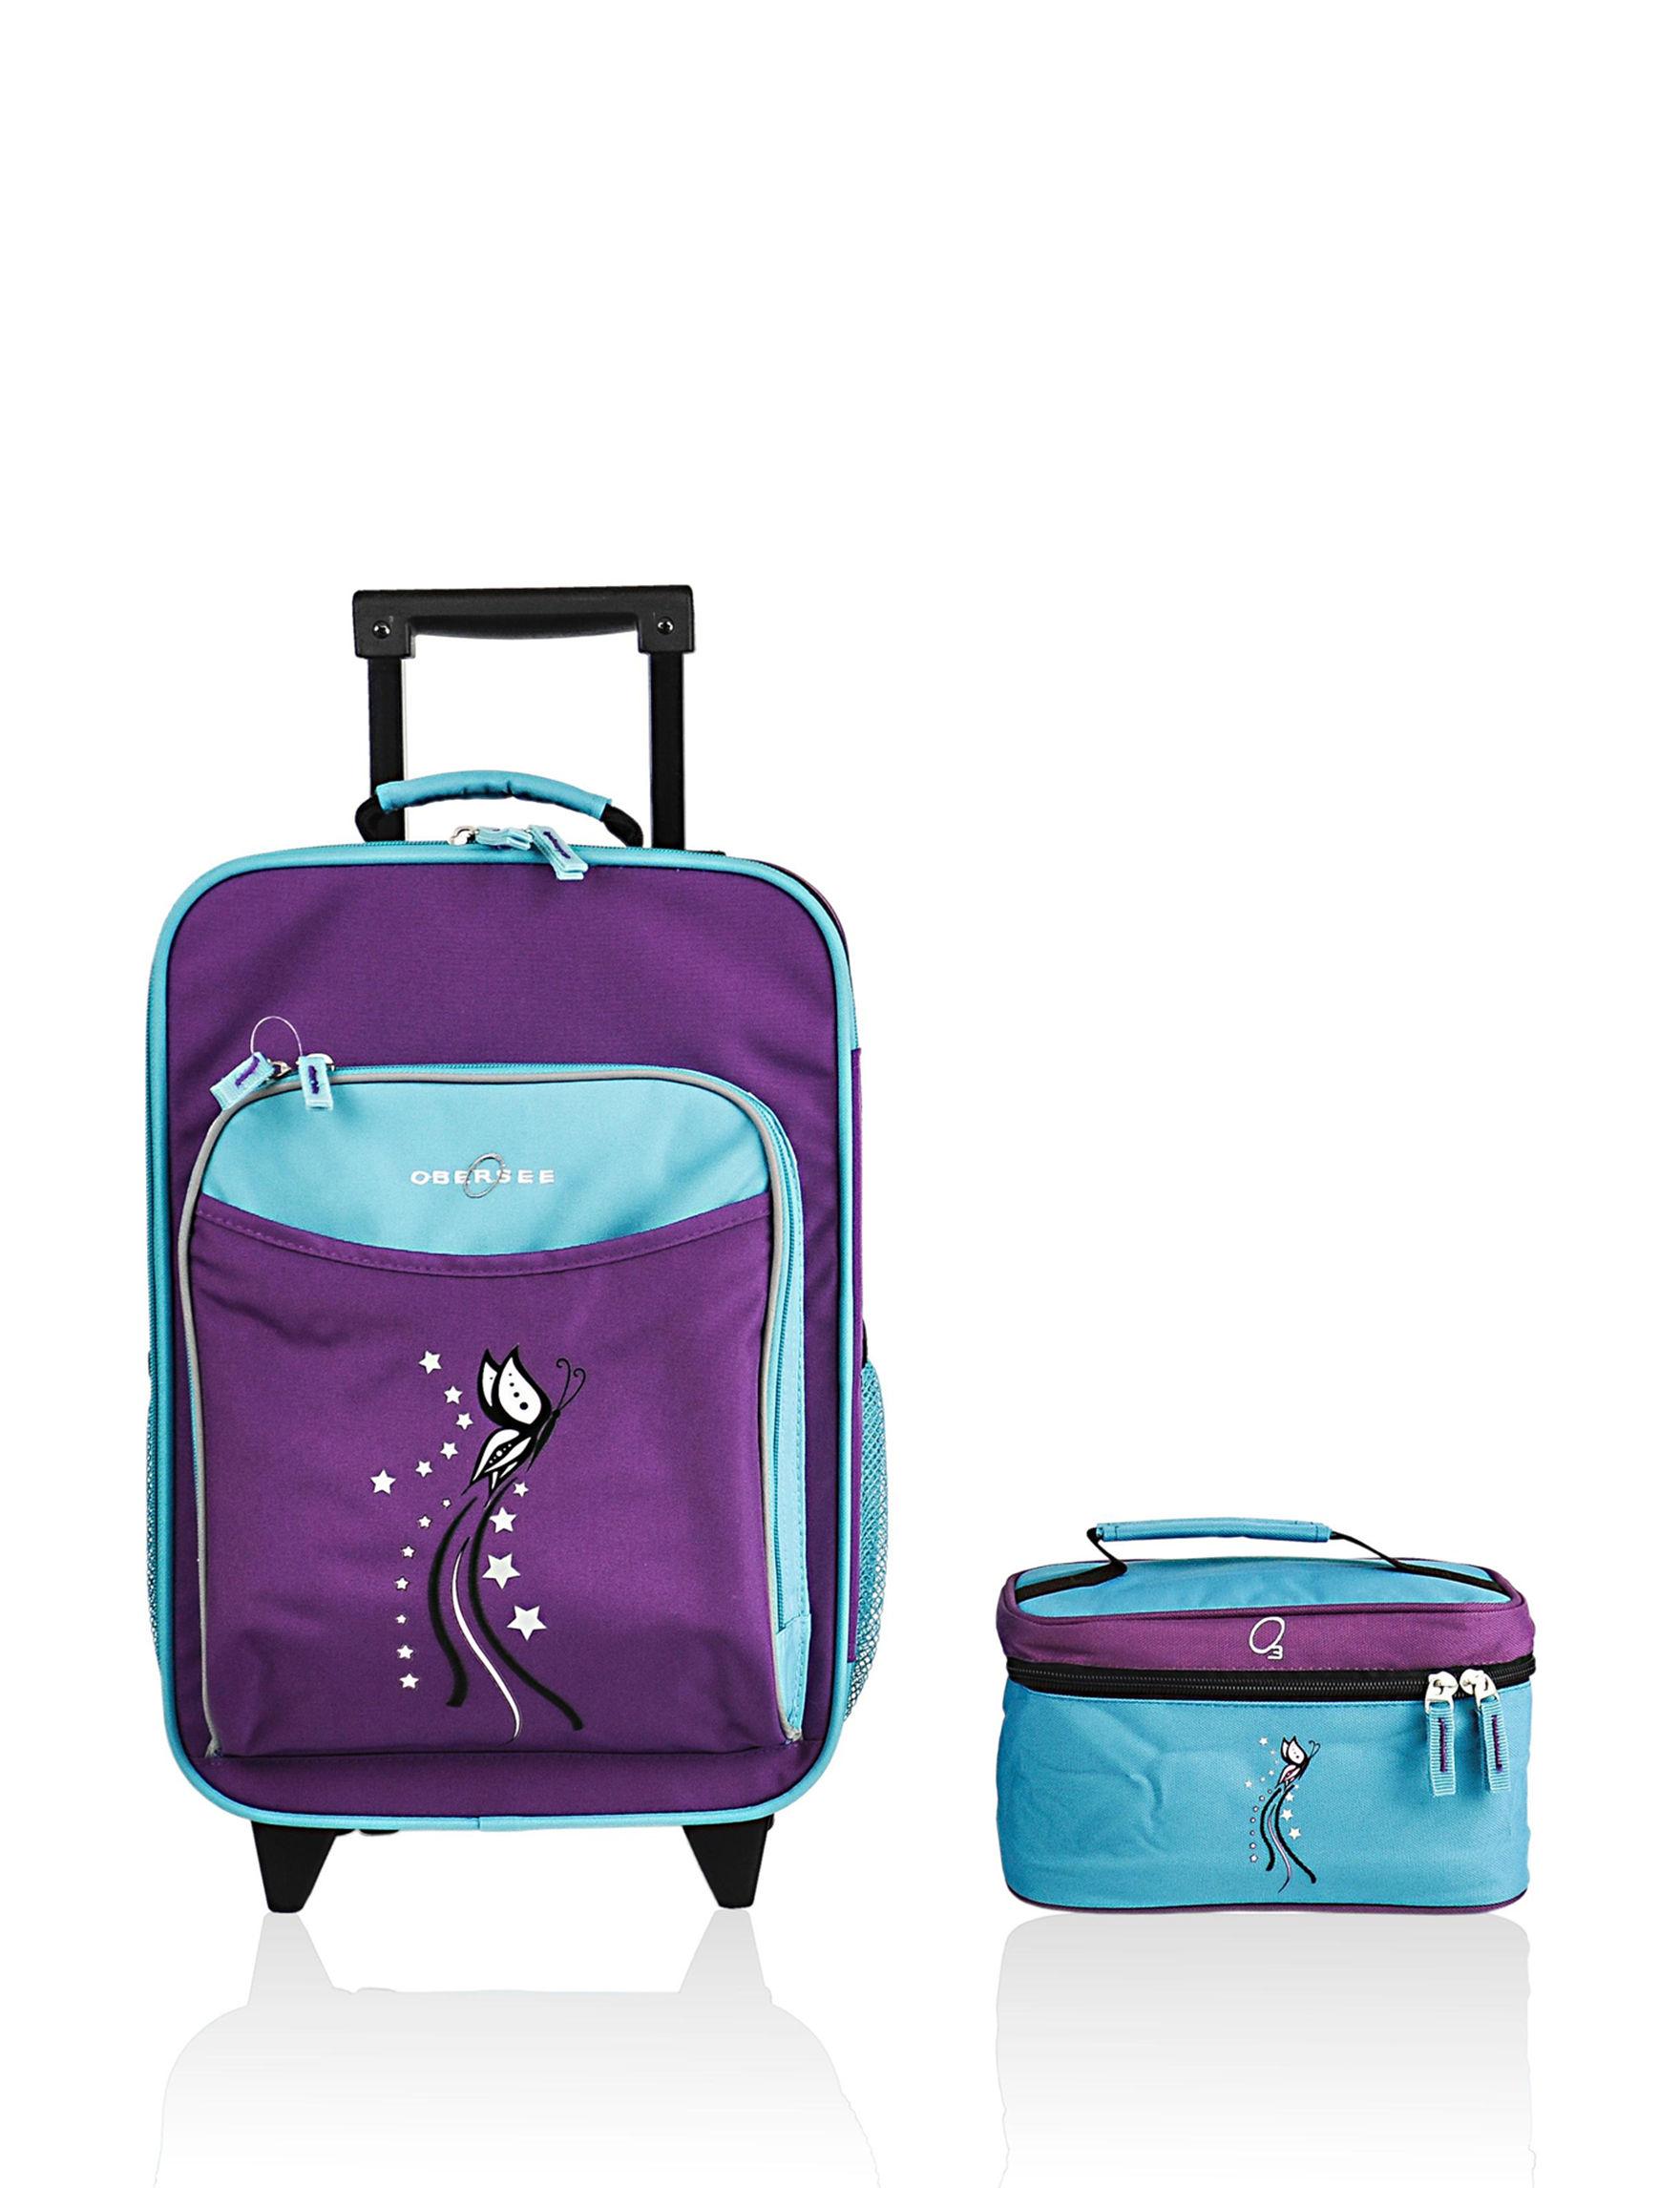 Obersee Blue / Purple Luggage Sets